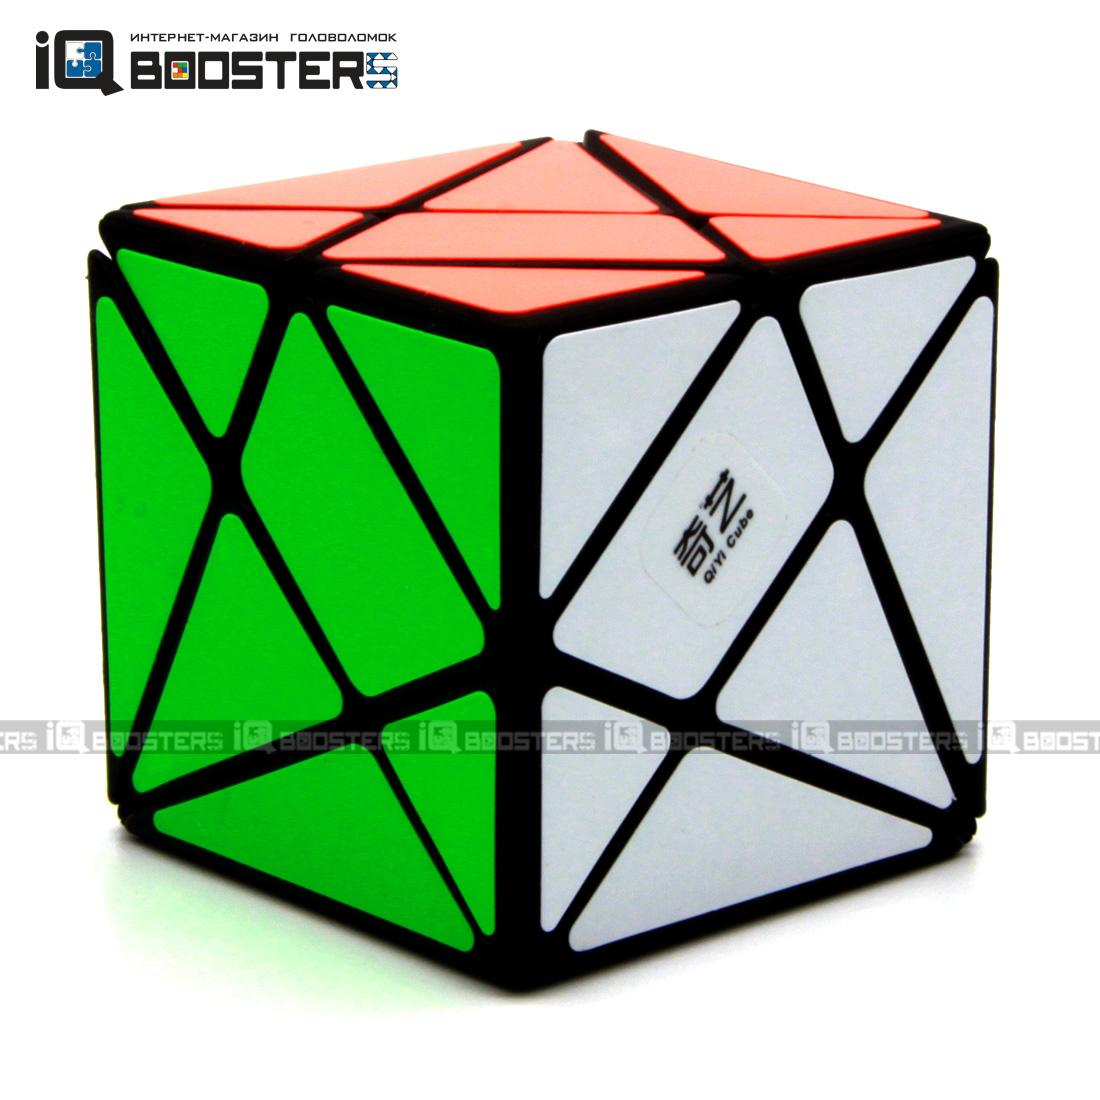 qiyi_axis_cube_1